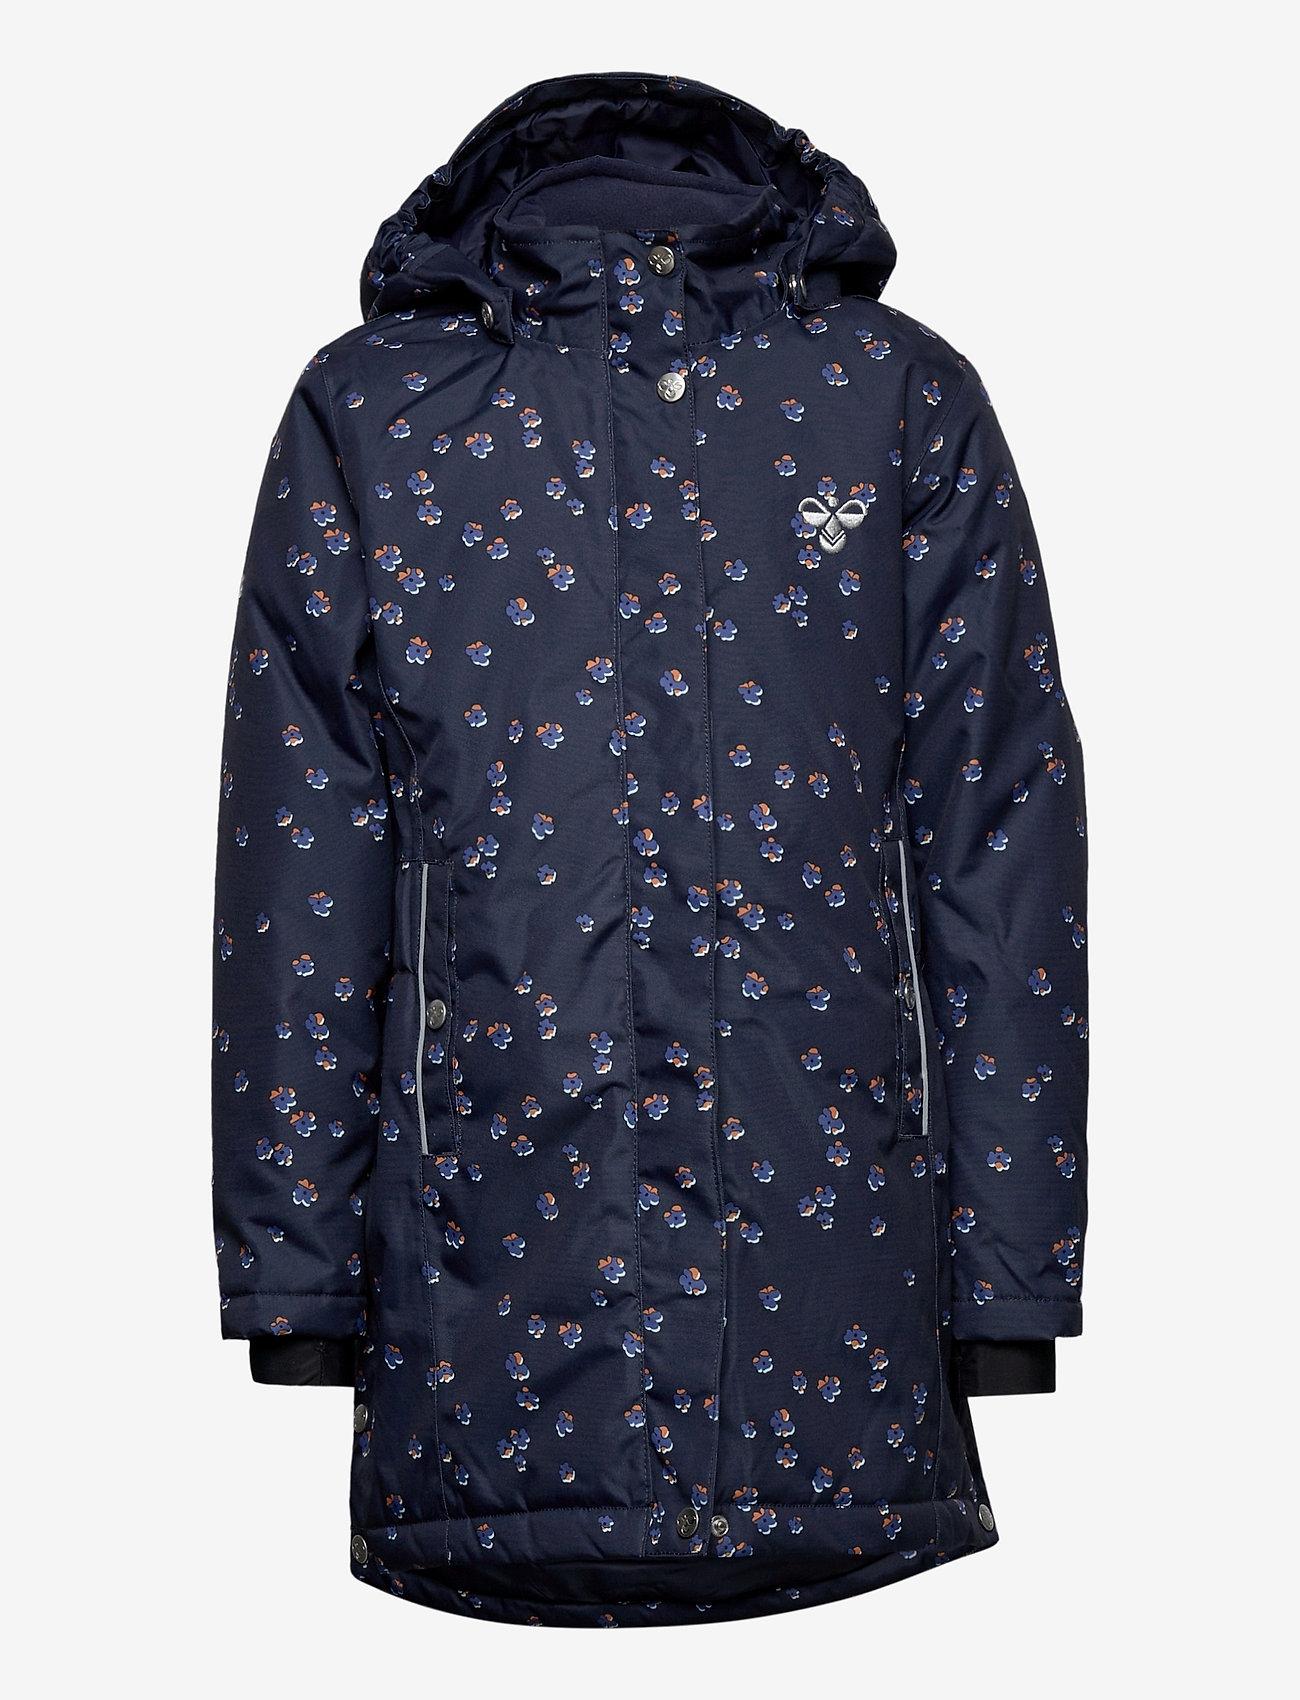 Hummel - hmlMARTHA COAT - bomber jackets - black iris/marlin - 0